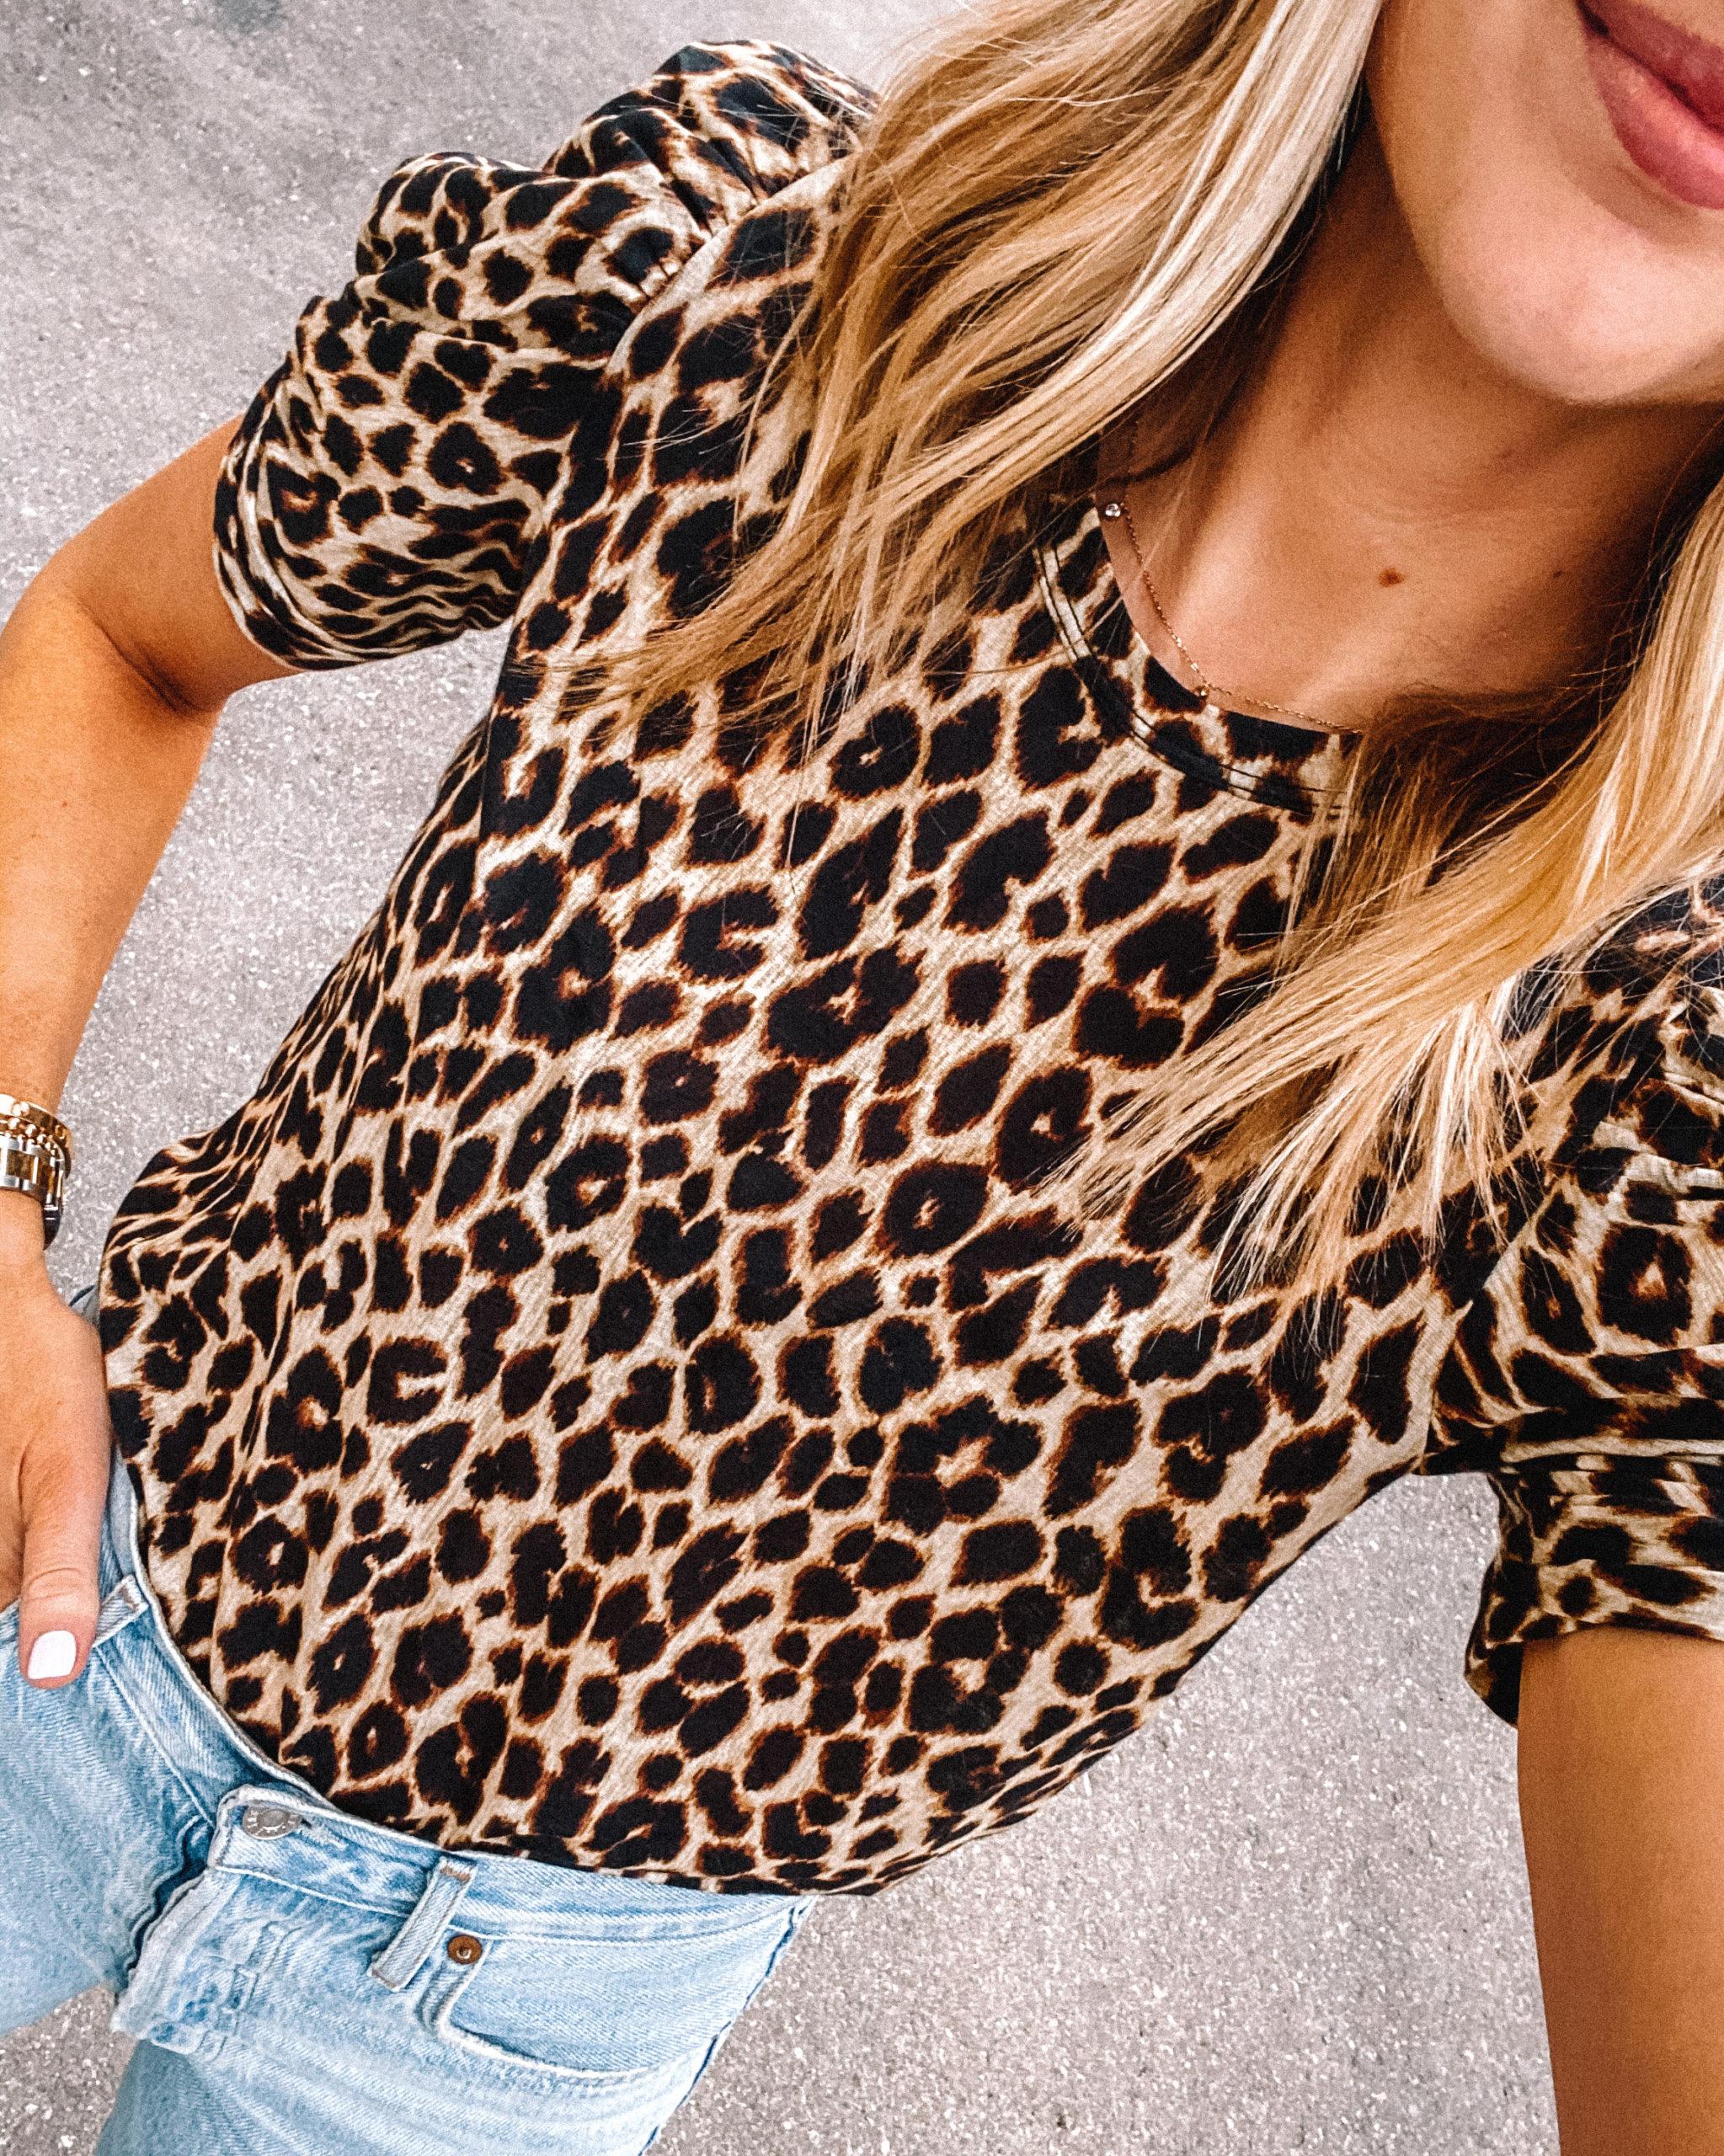 Fashion Jackson Wearing A.L.C. Kati Tee Leopard